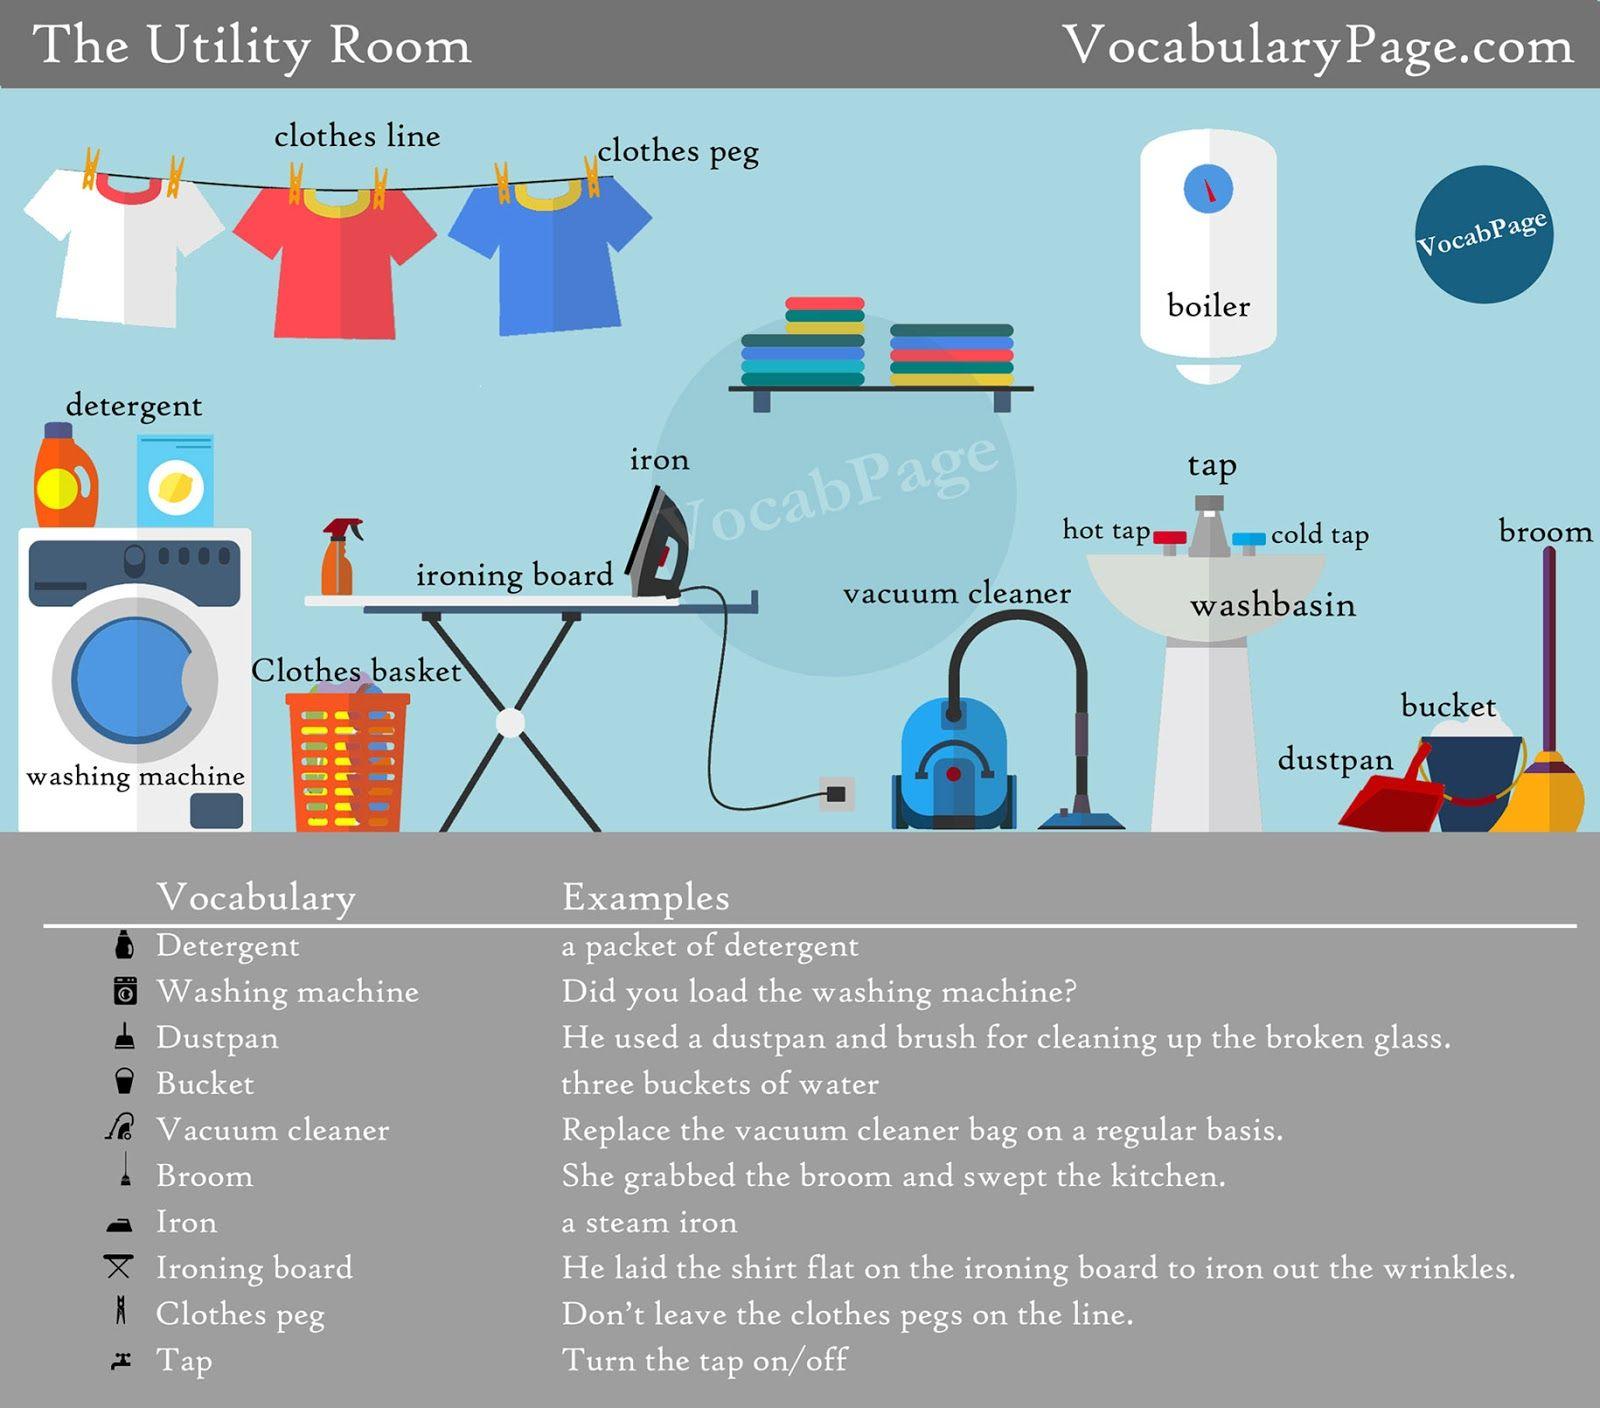 The Utility Room Vocabulary